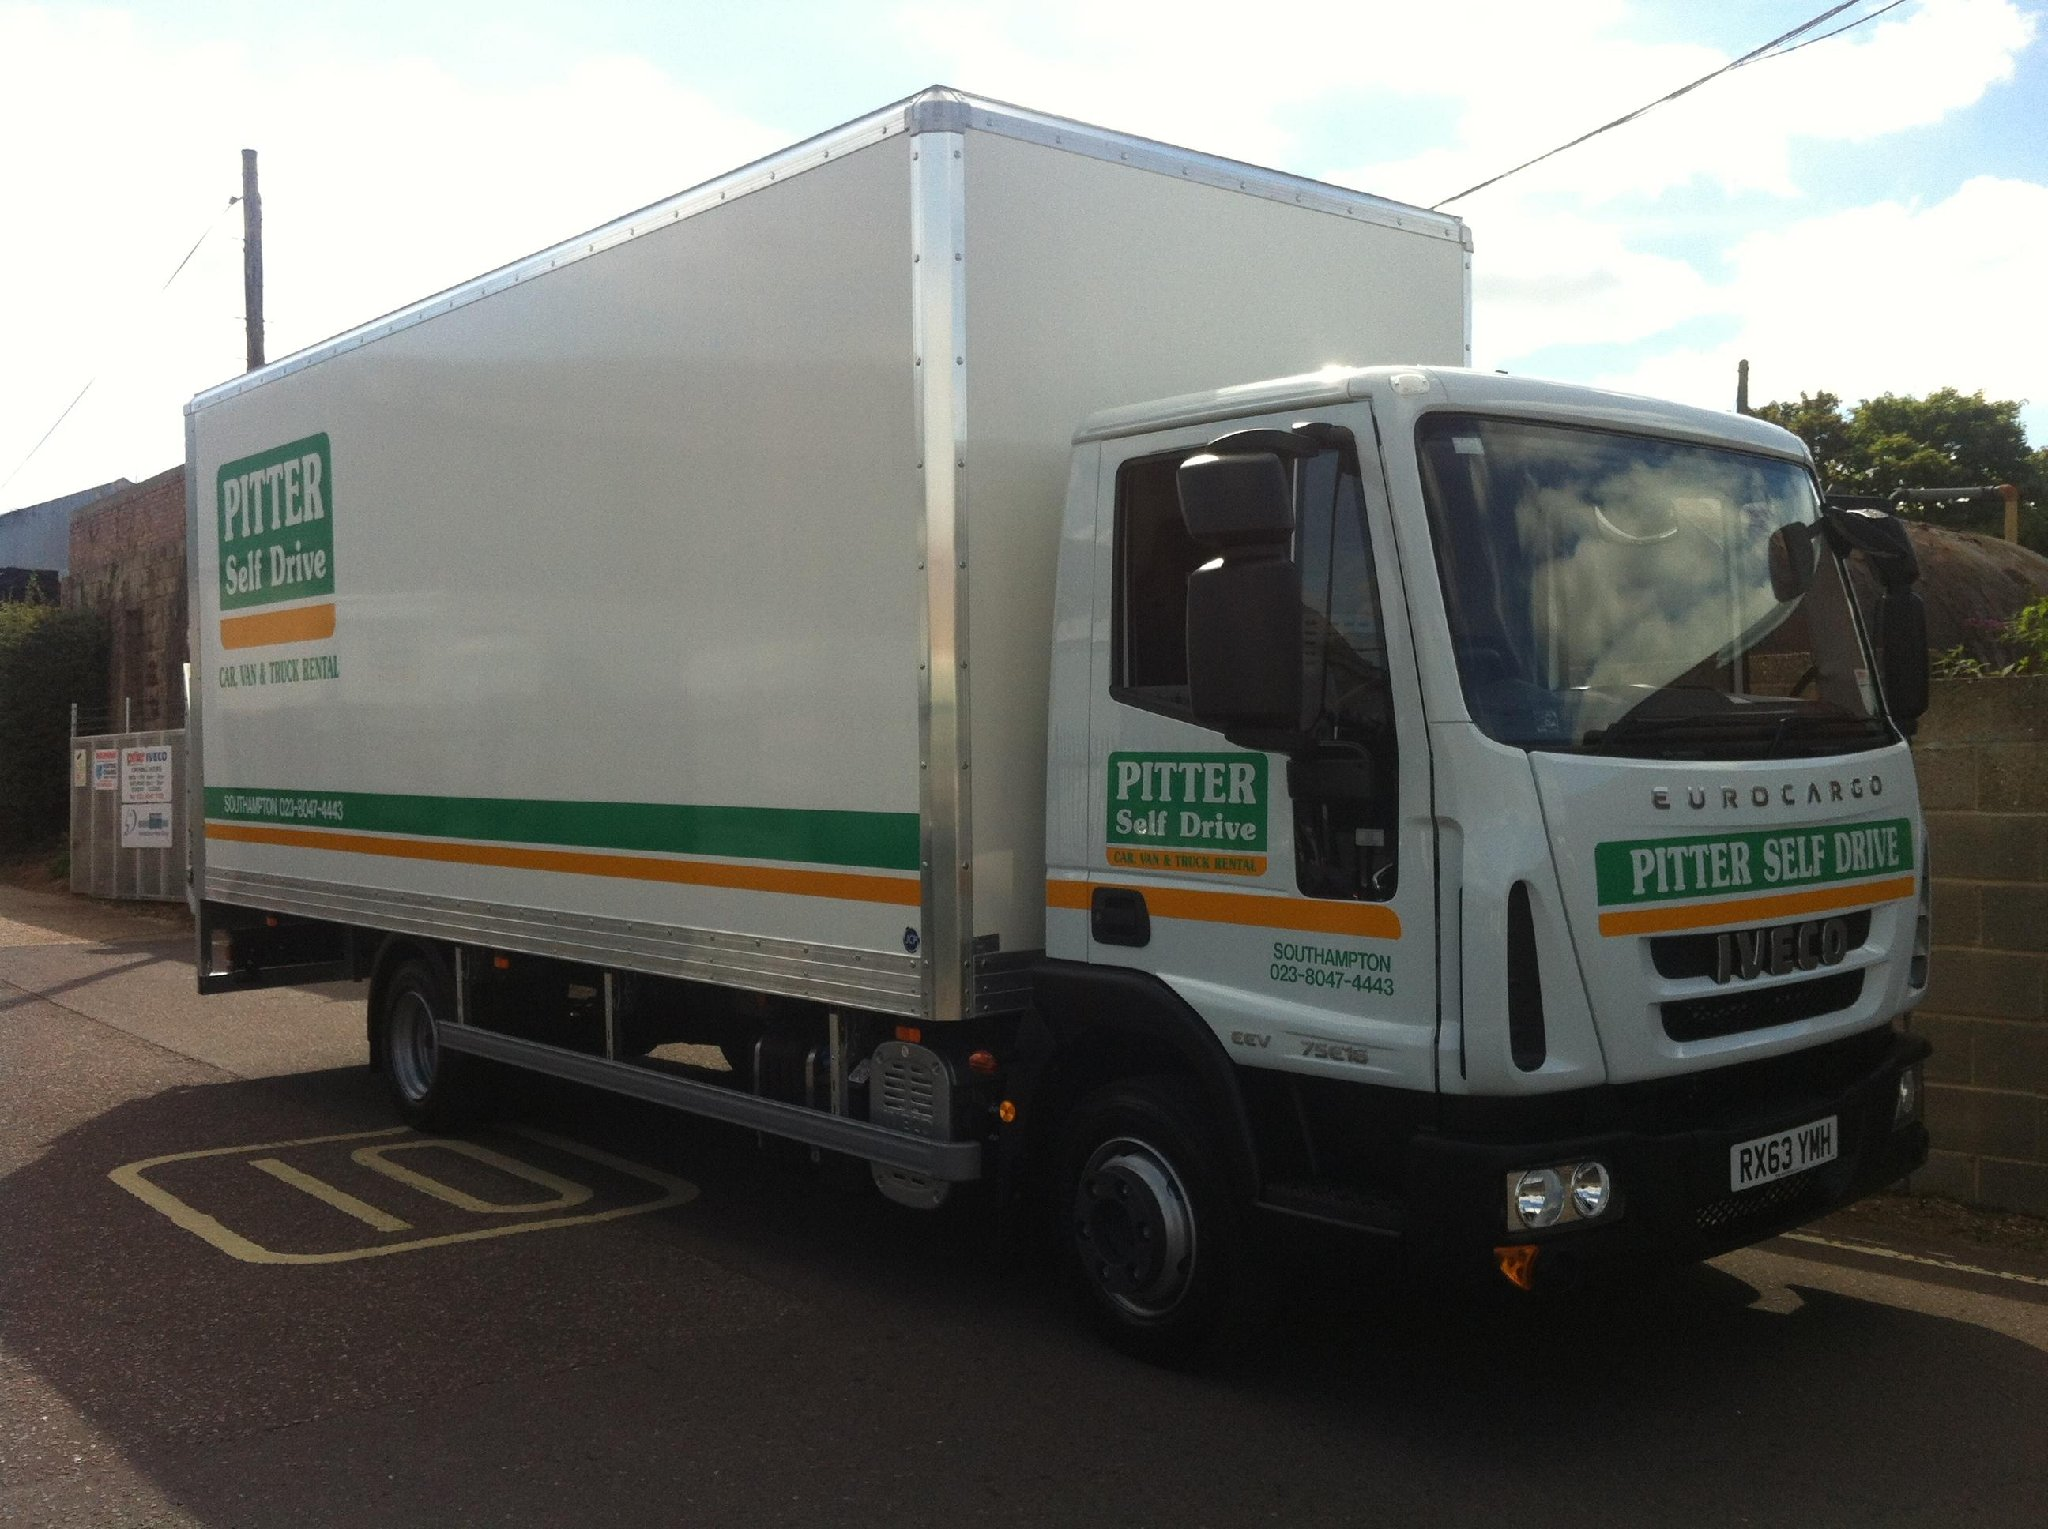 pitter self drive ltd van and truck dealers in. Black Bedroom Furniture Sets. Home Design Ideas